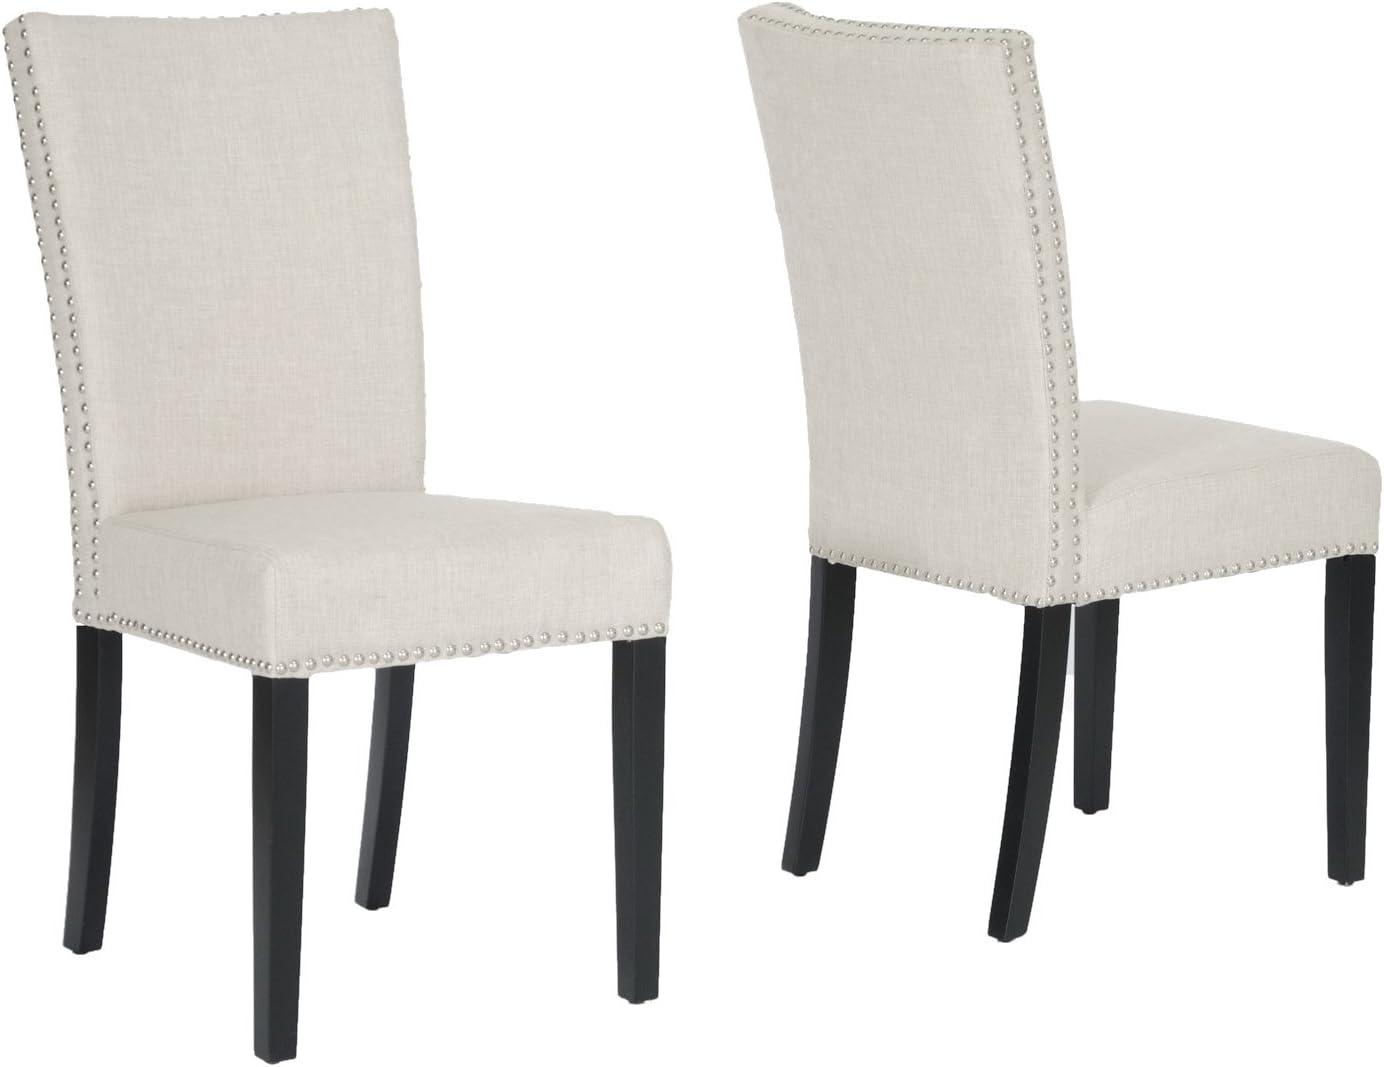 Baxton Studio Harrowgate Linen Modern Dining Chair